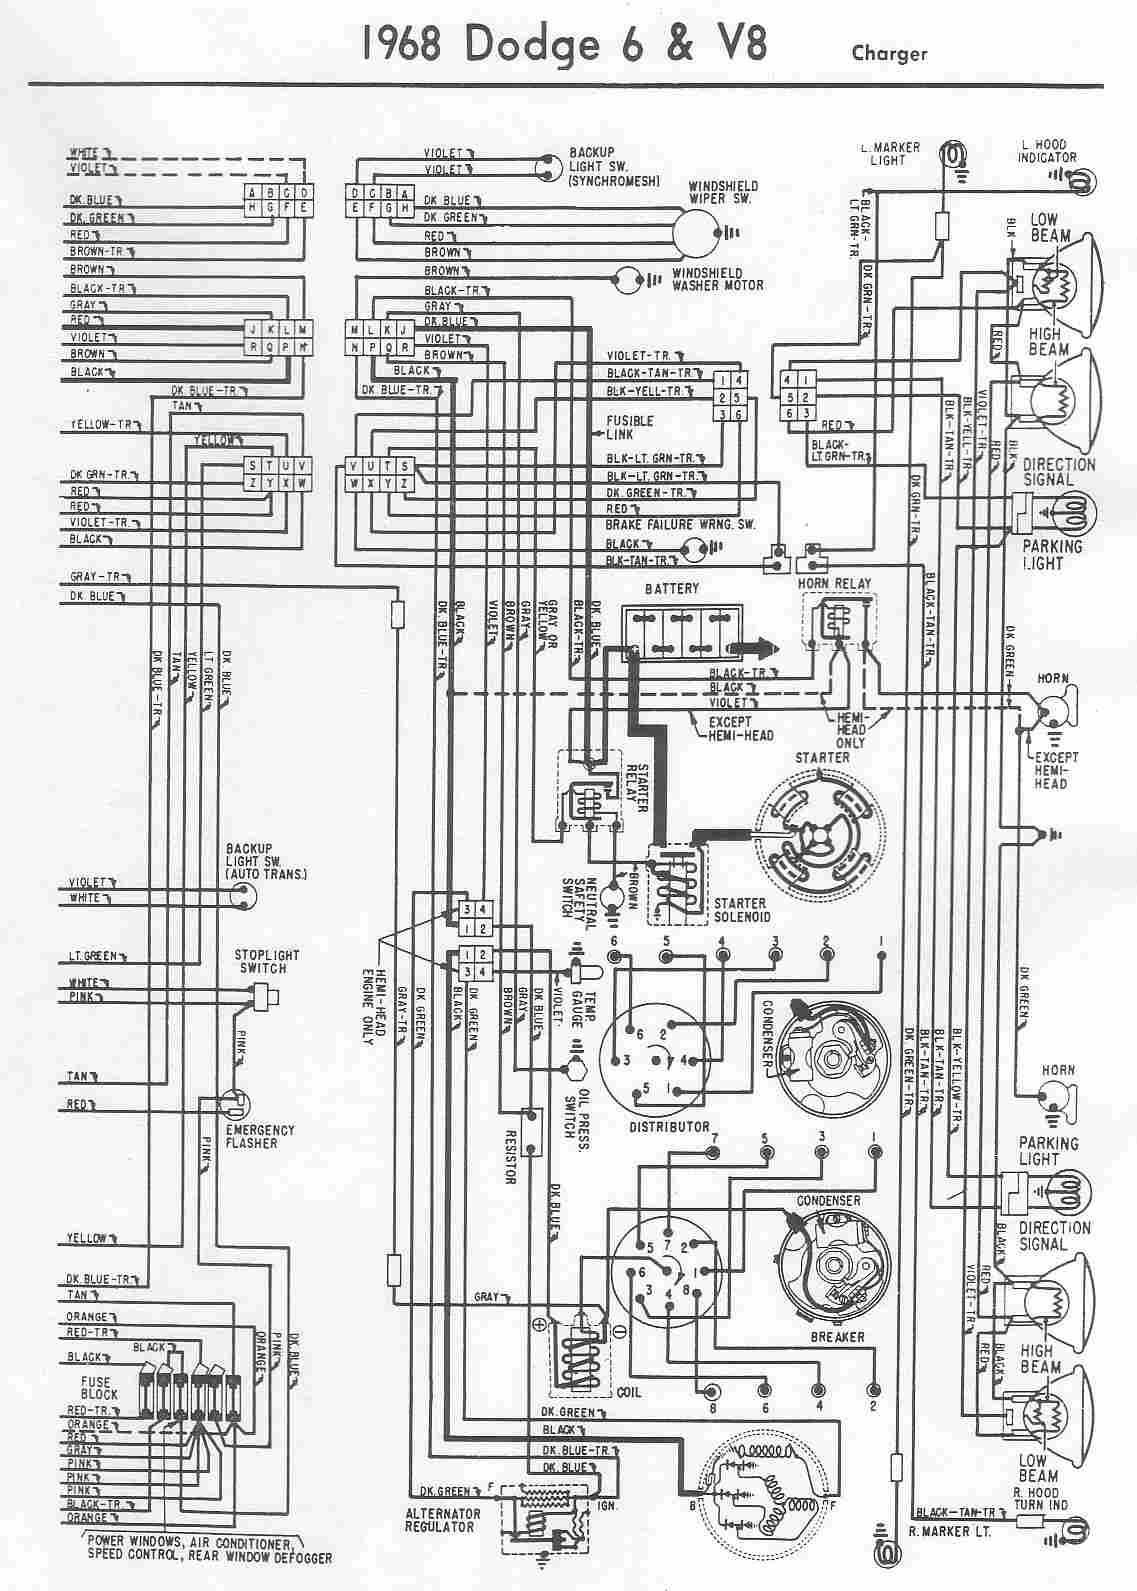 1972 dodge dart wiring diagram